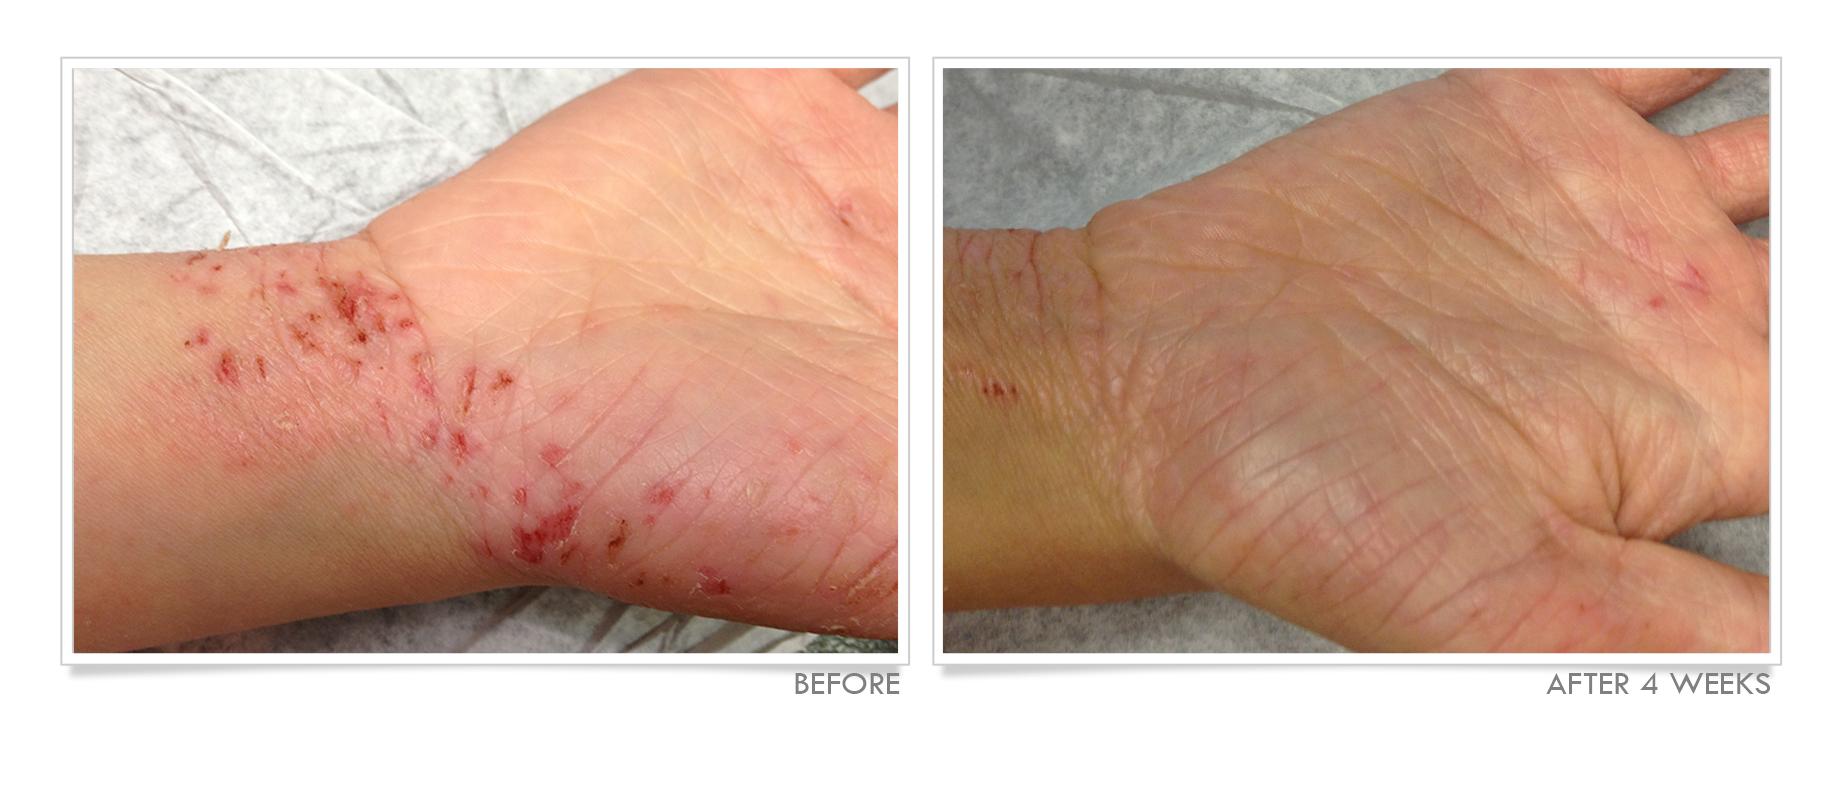 Bleach Baths for Eczema Treatment